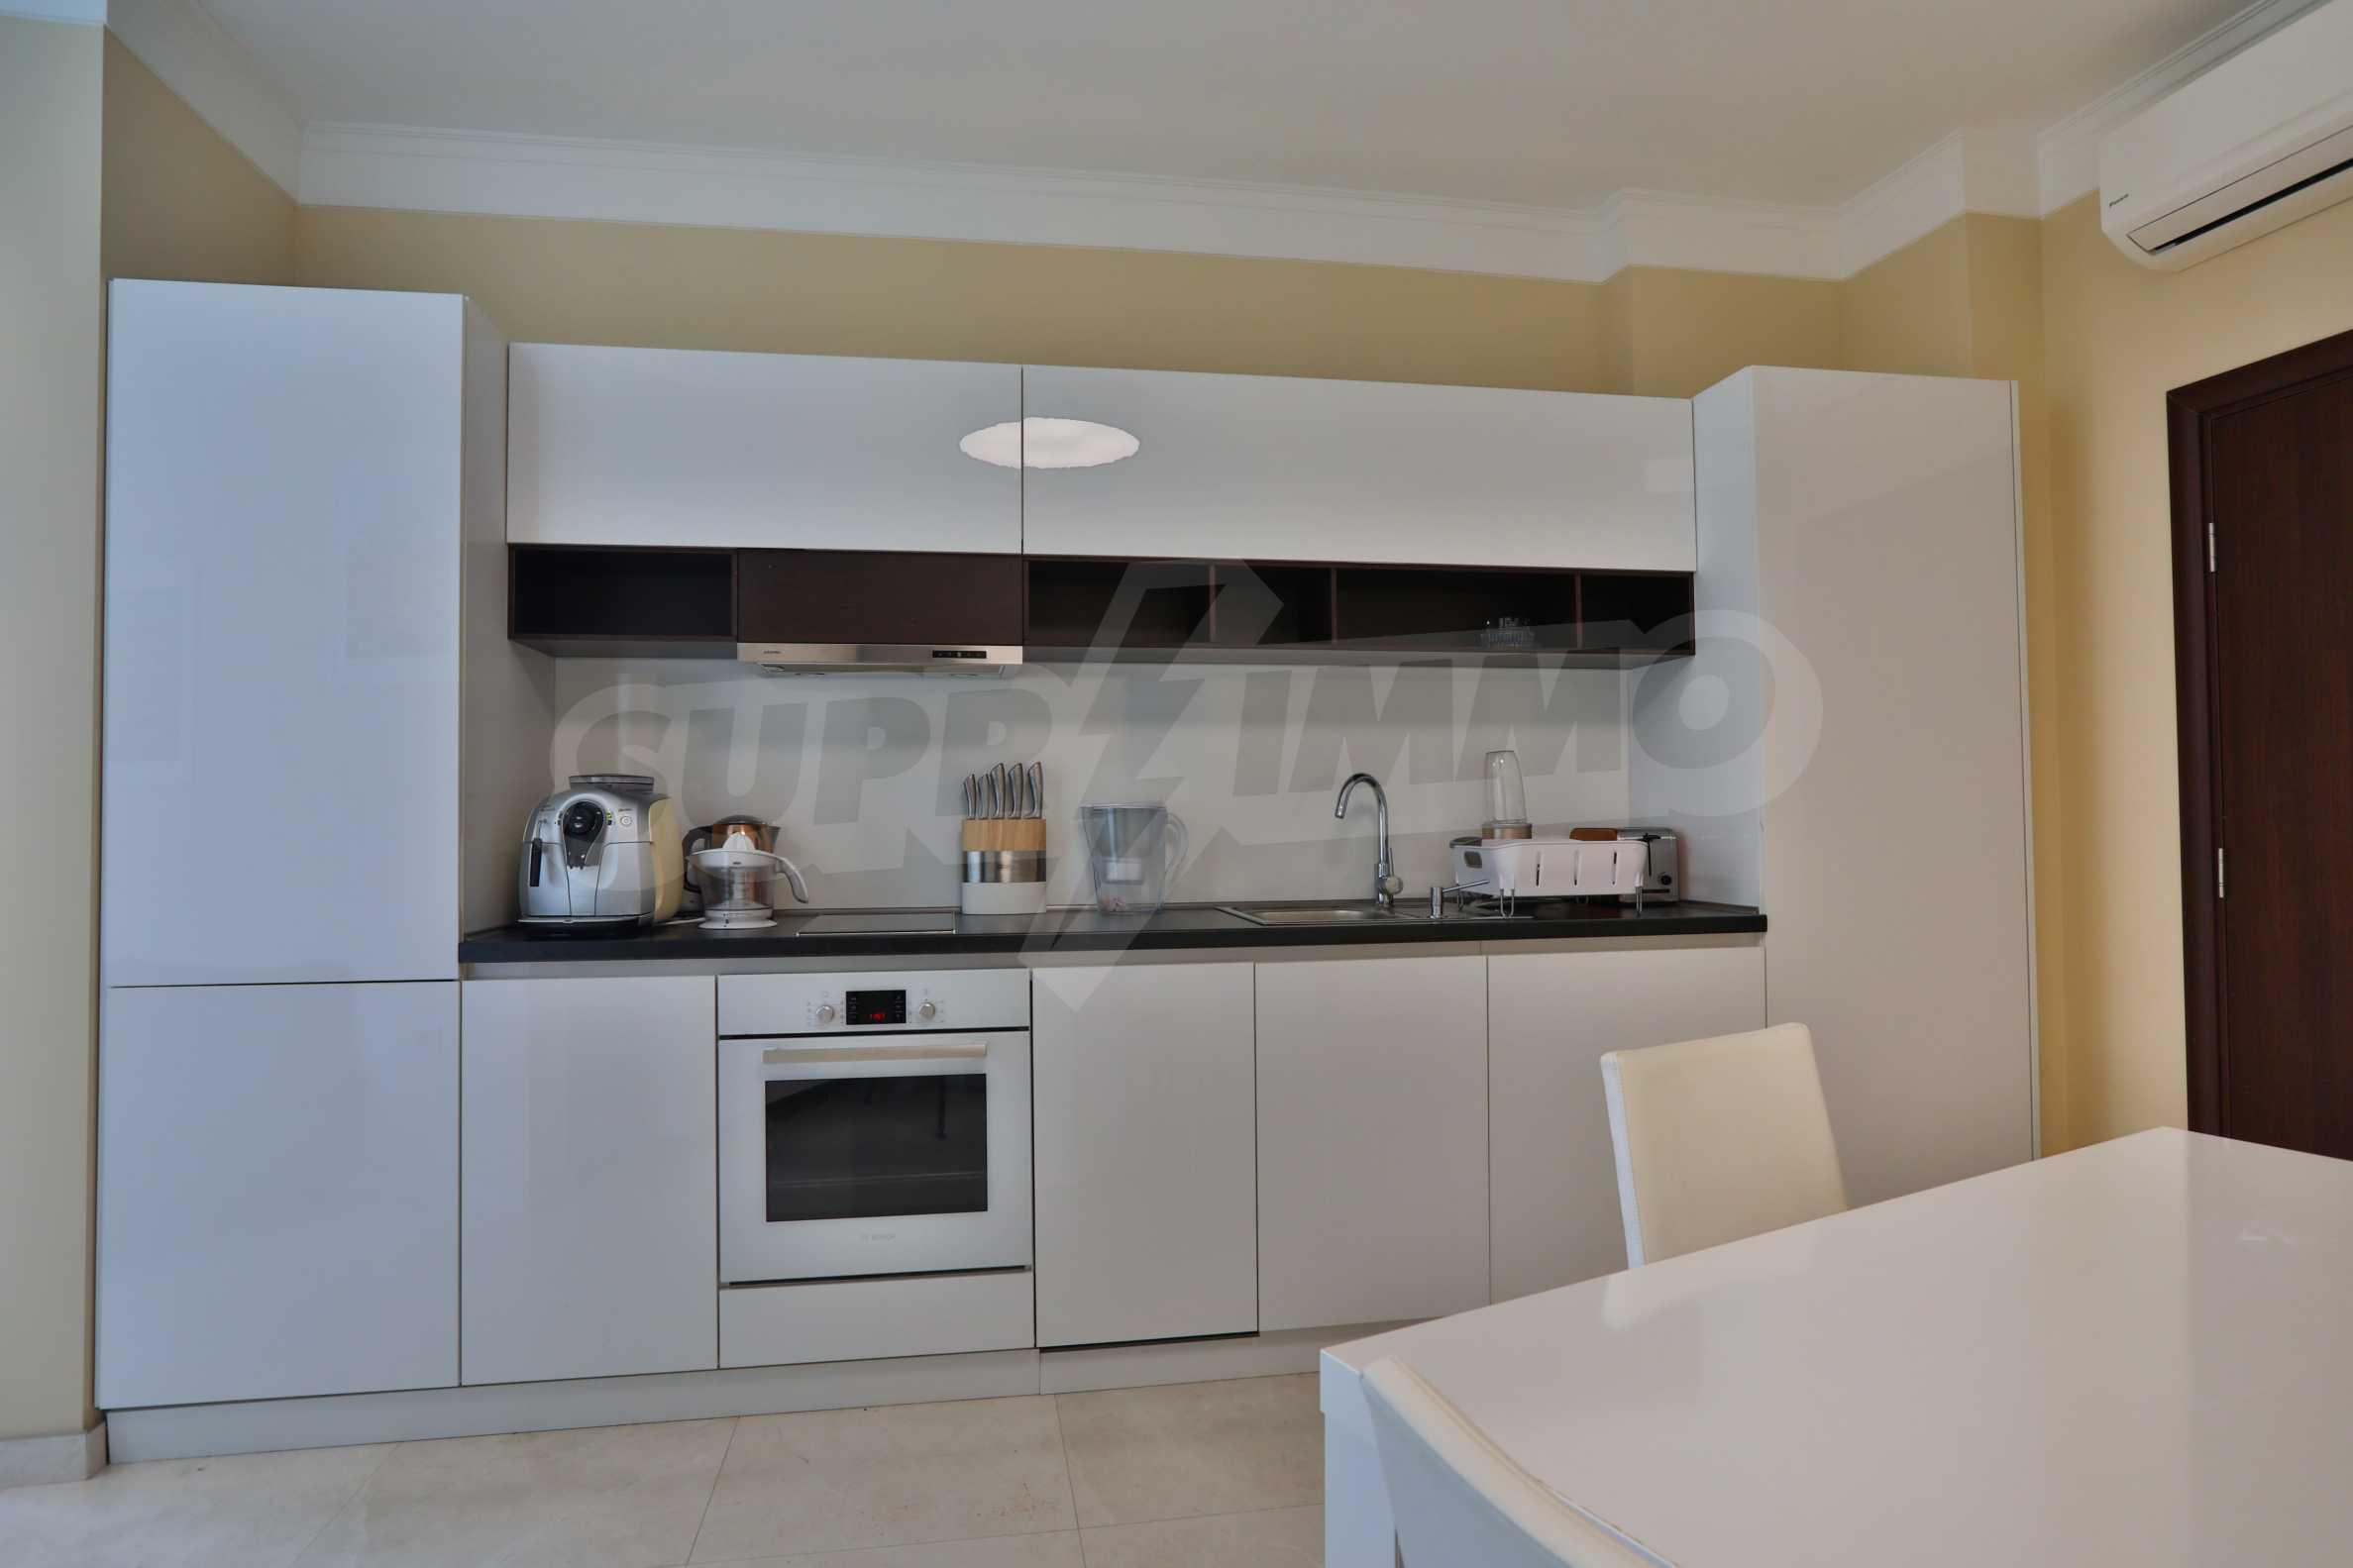 Exclusive 2-bedroom beachfront apartment in the prestigious Belle Époque Beach Residence 13